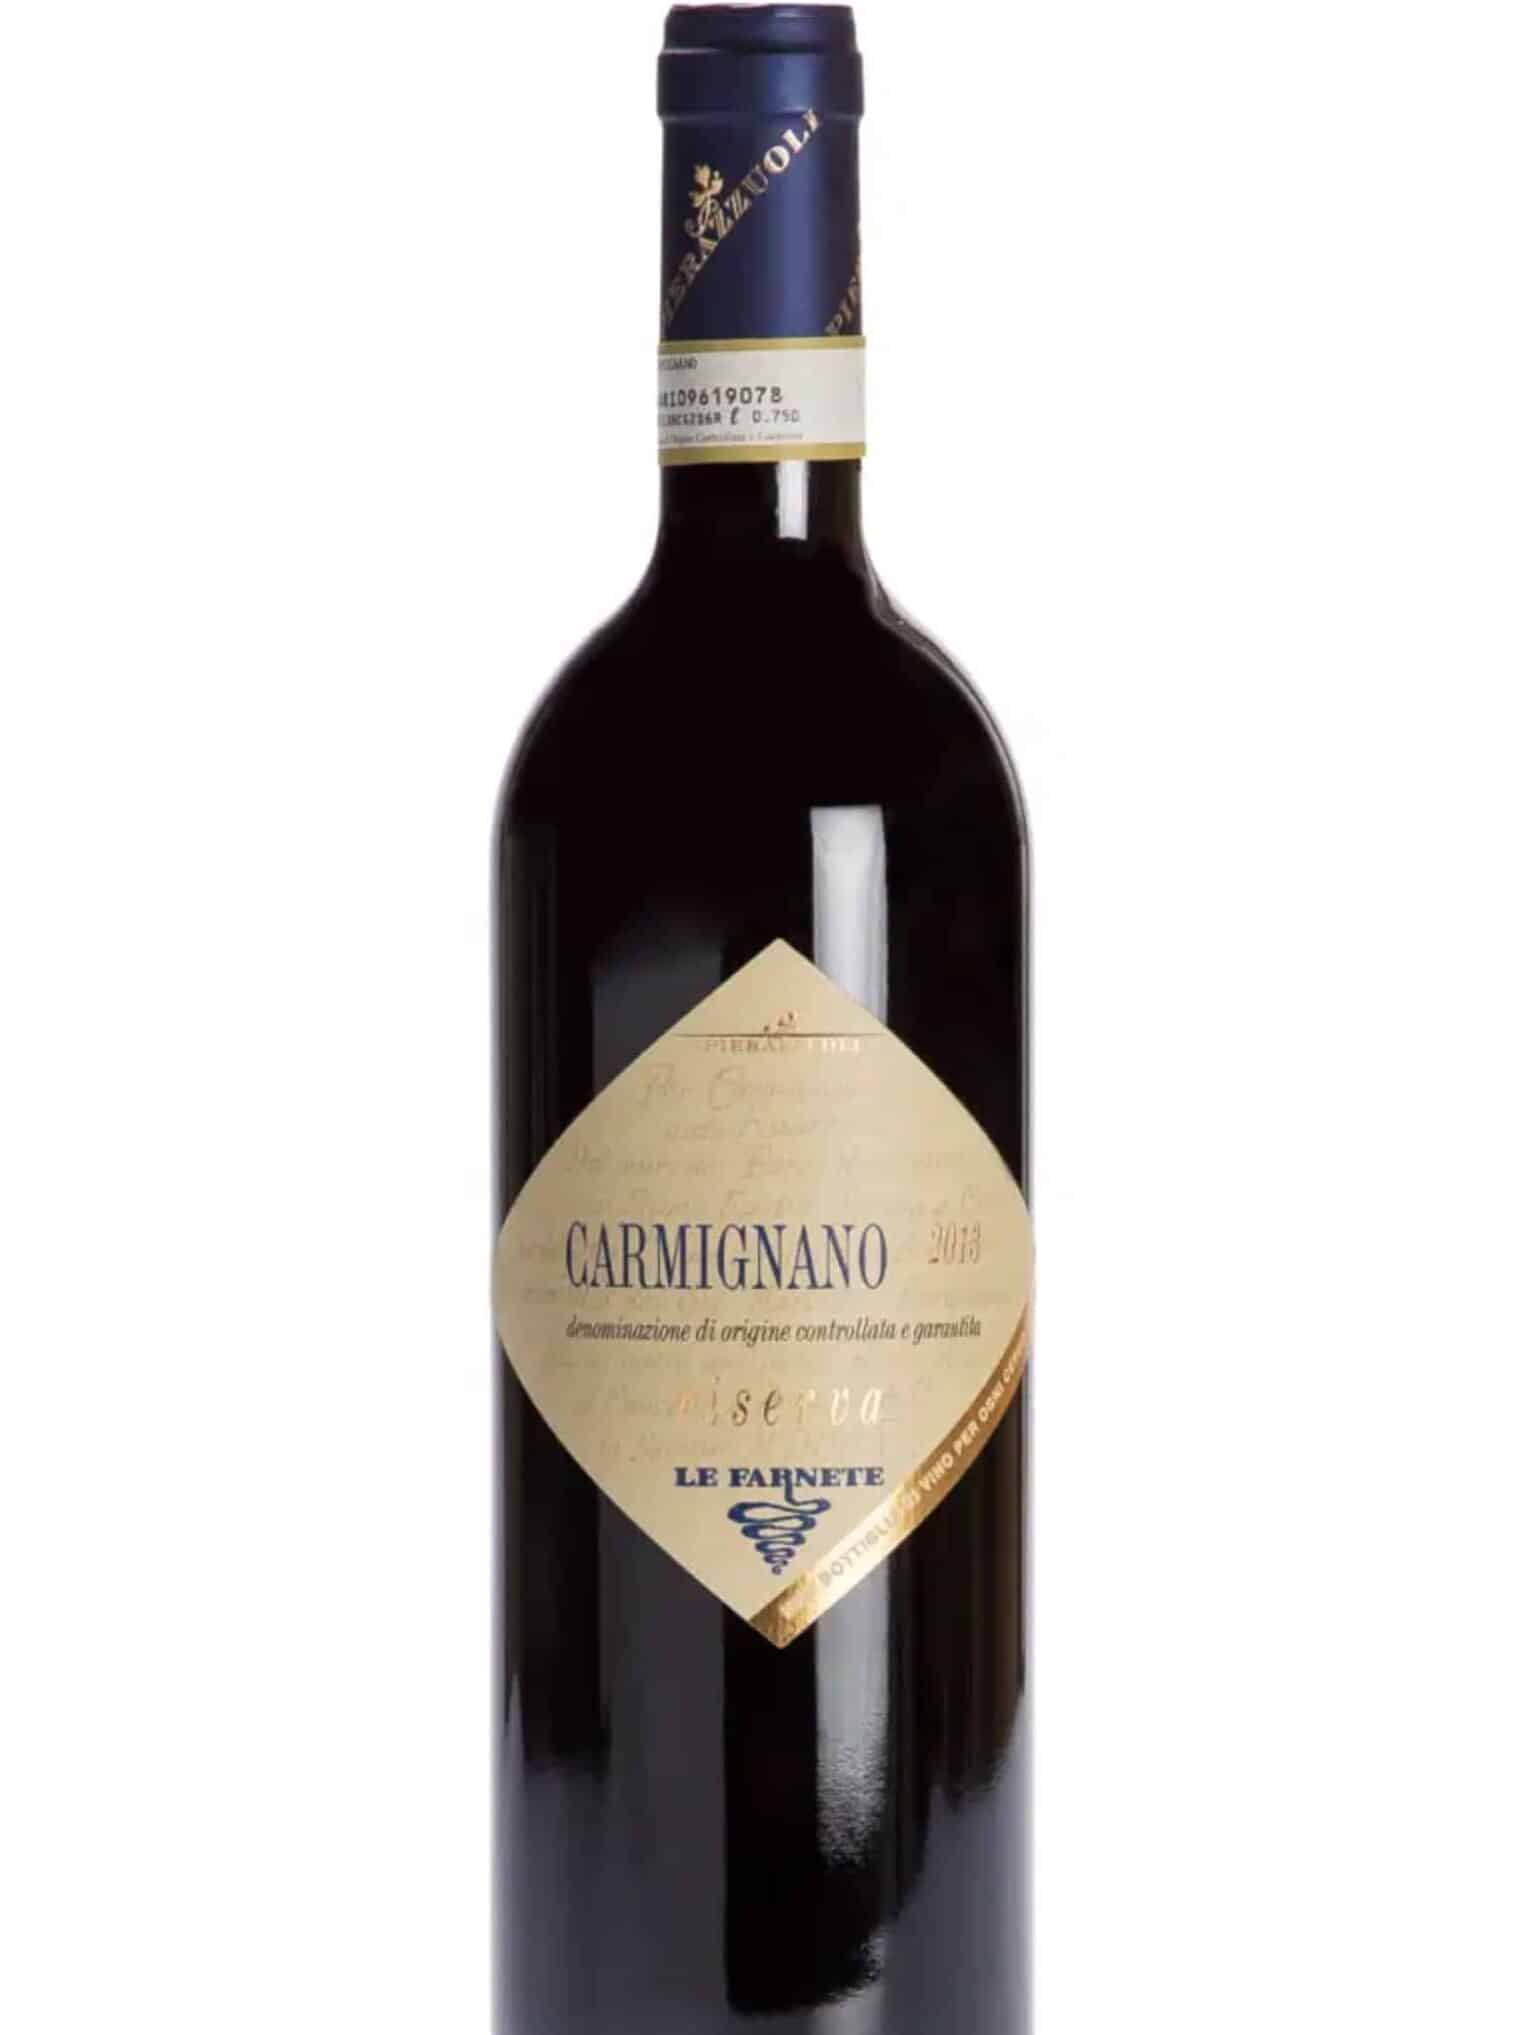 Carmignano wine